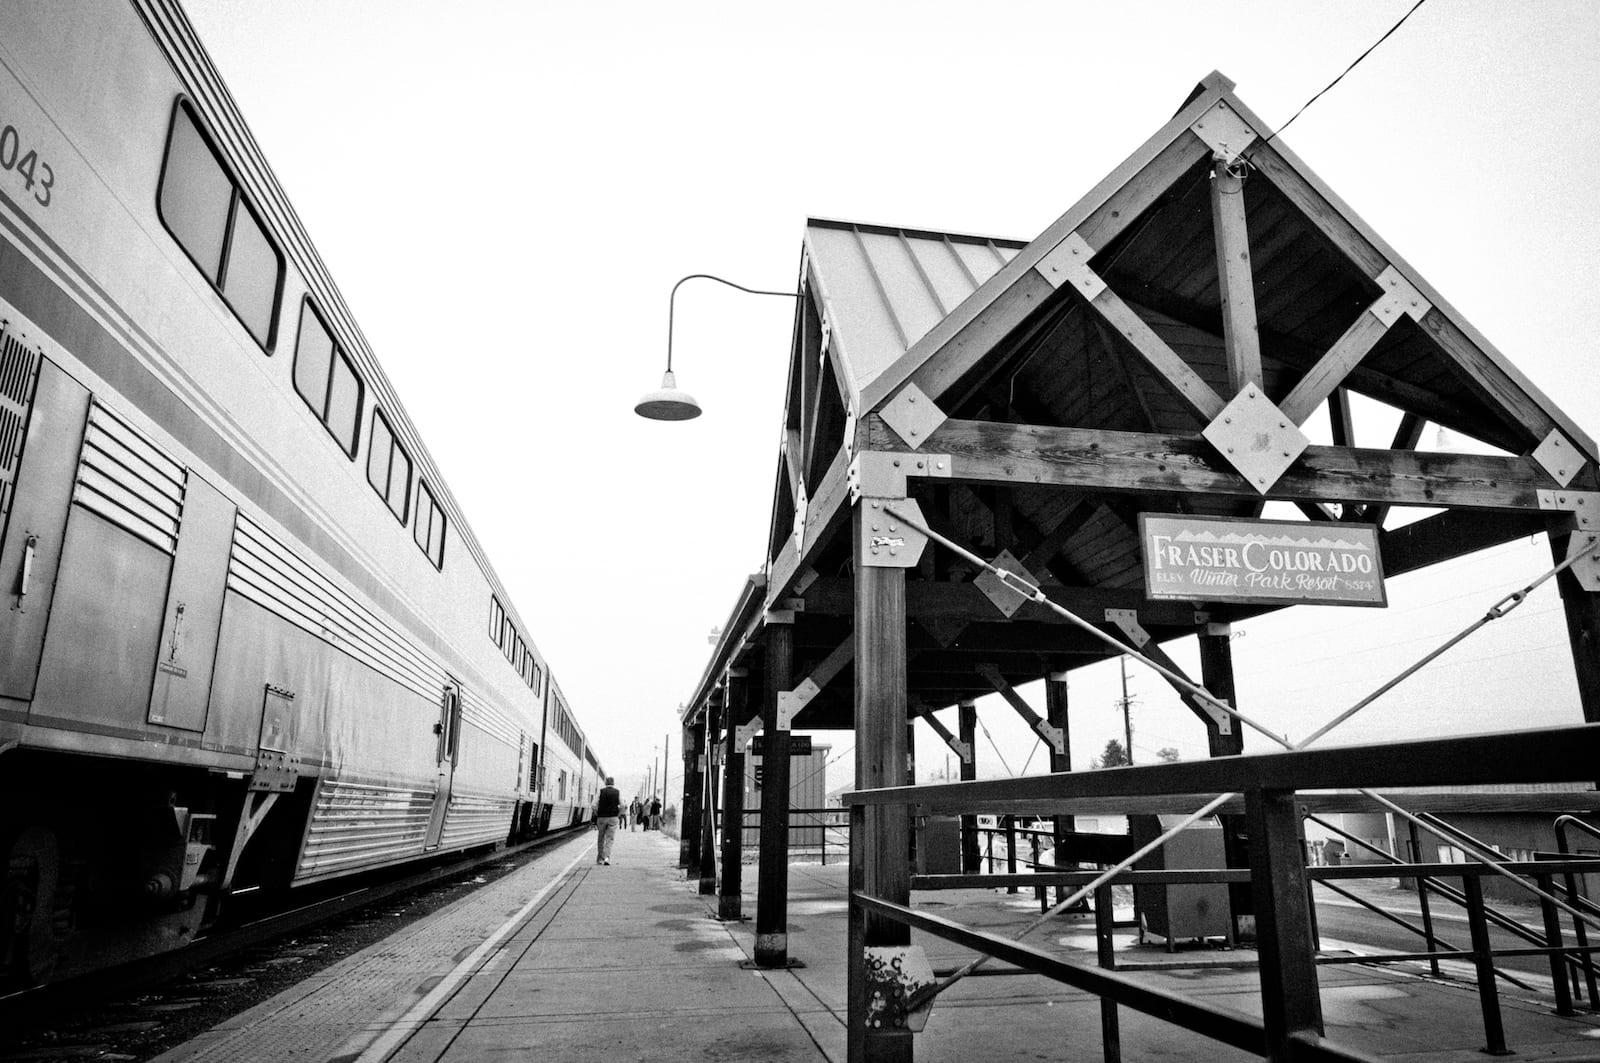 Amtrak California Zephyr Train Fraser Colorado